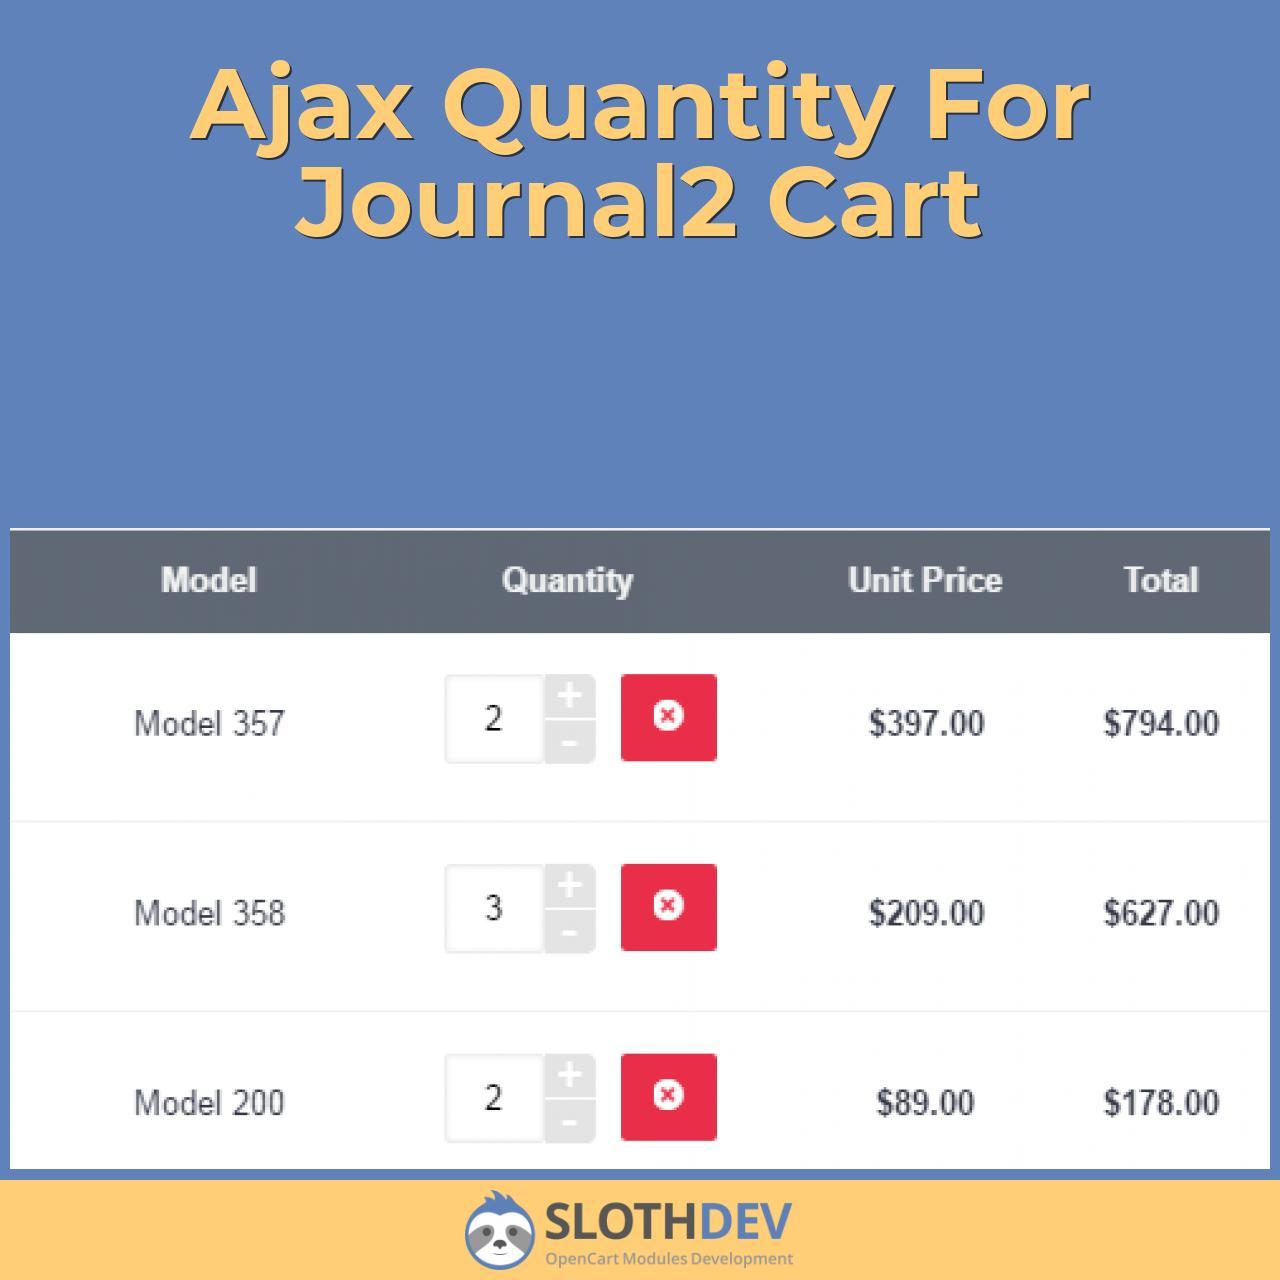 Ajax Quantity For Journal2 Cart